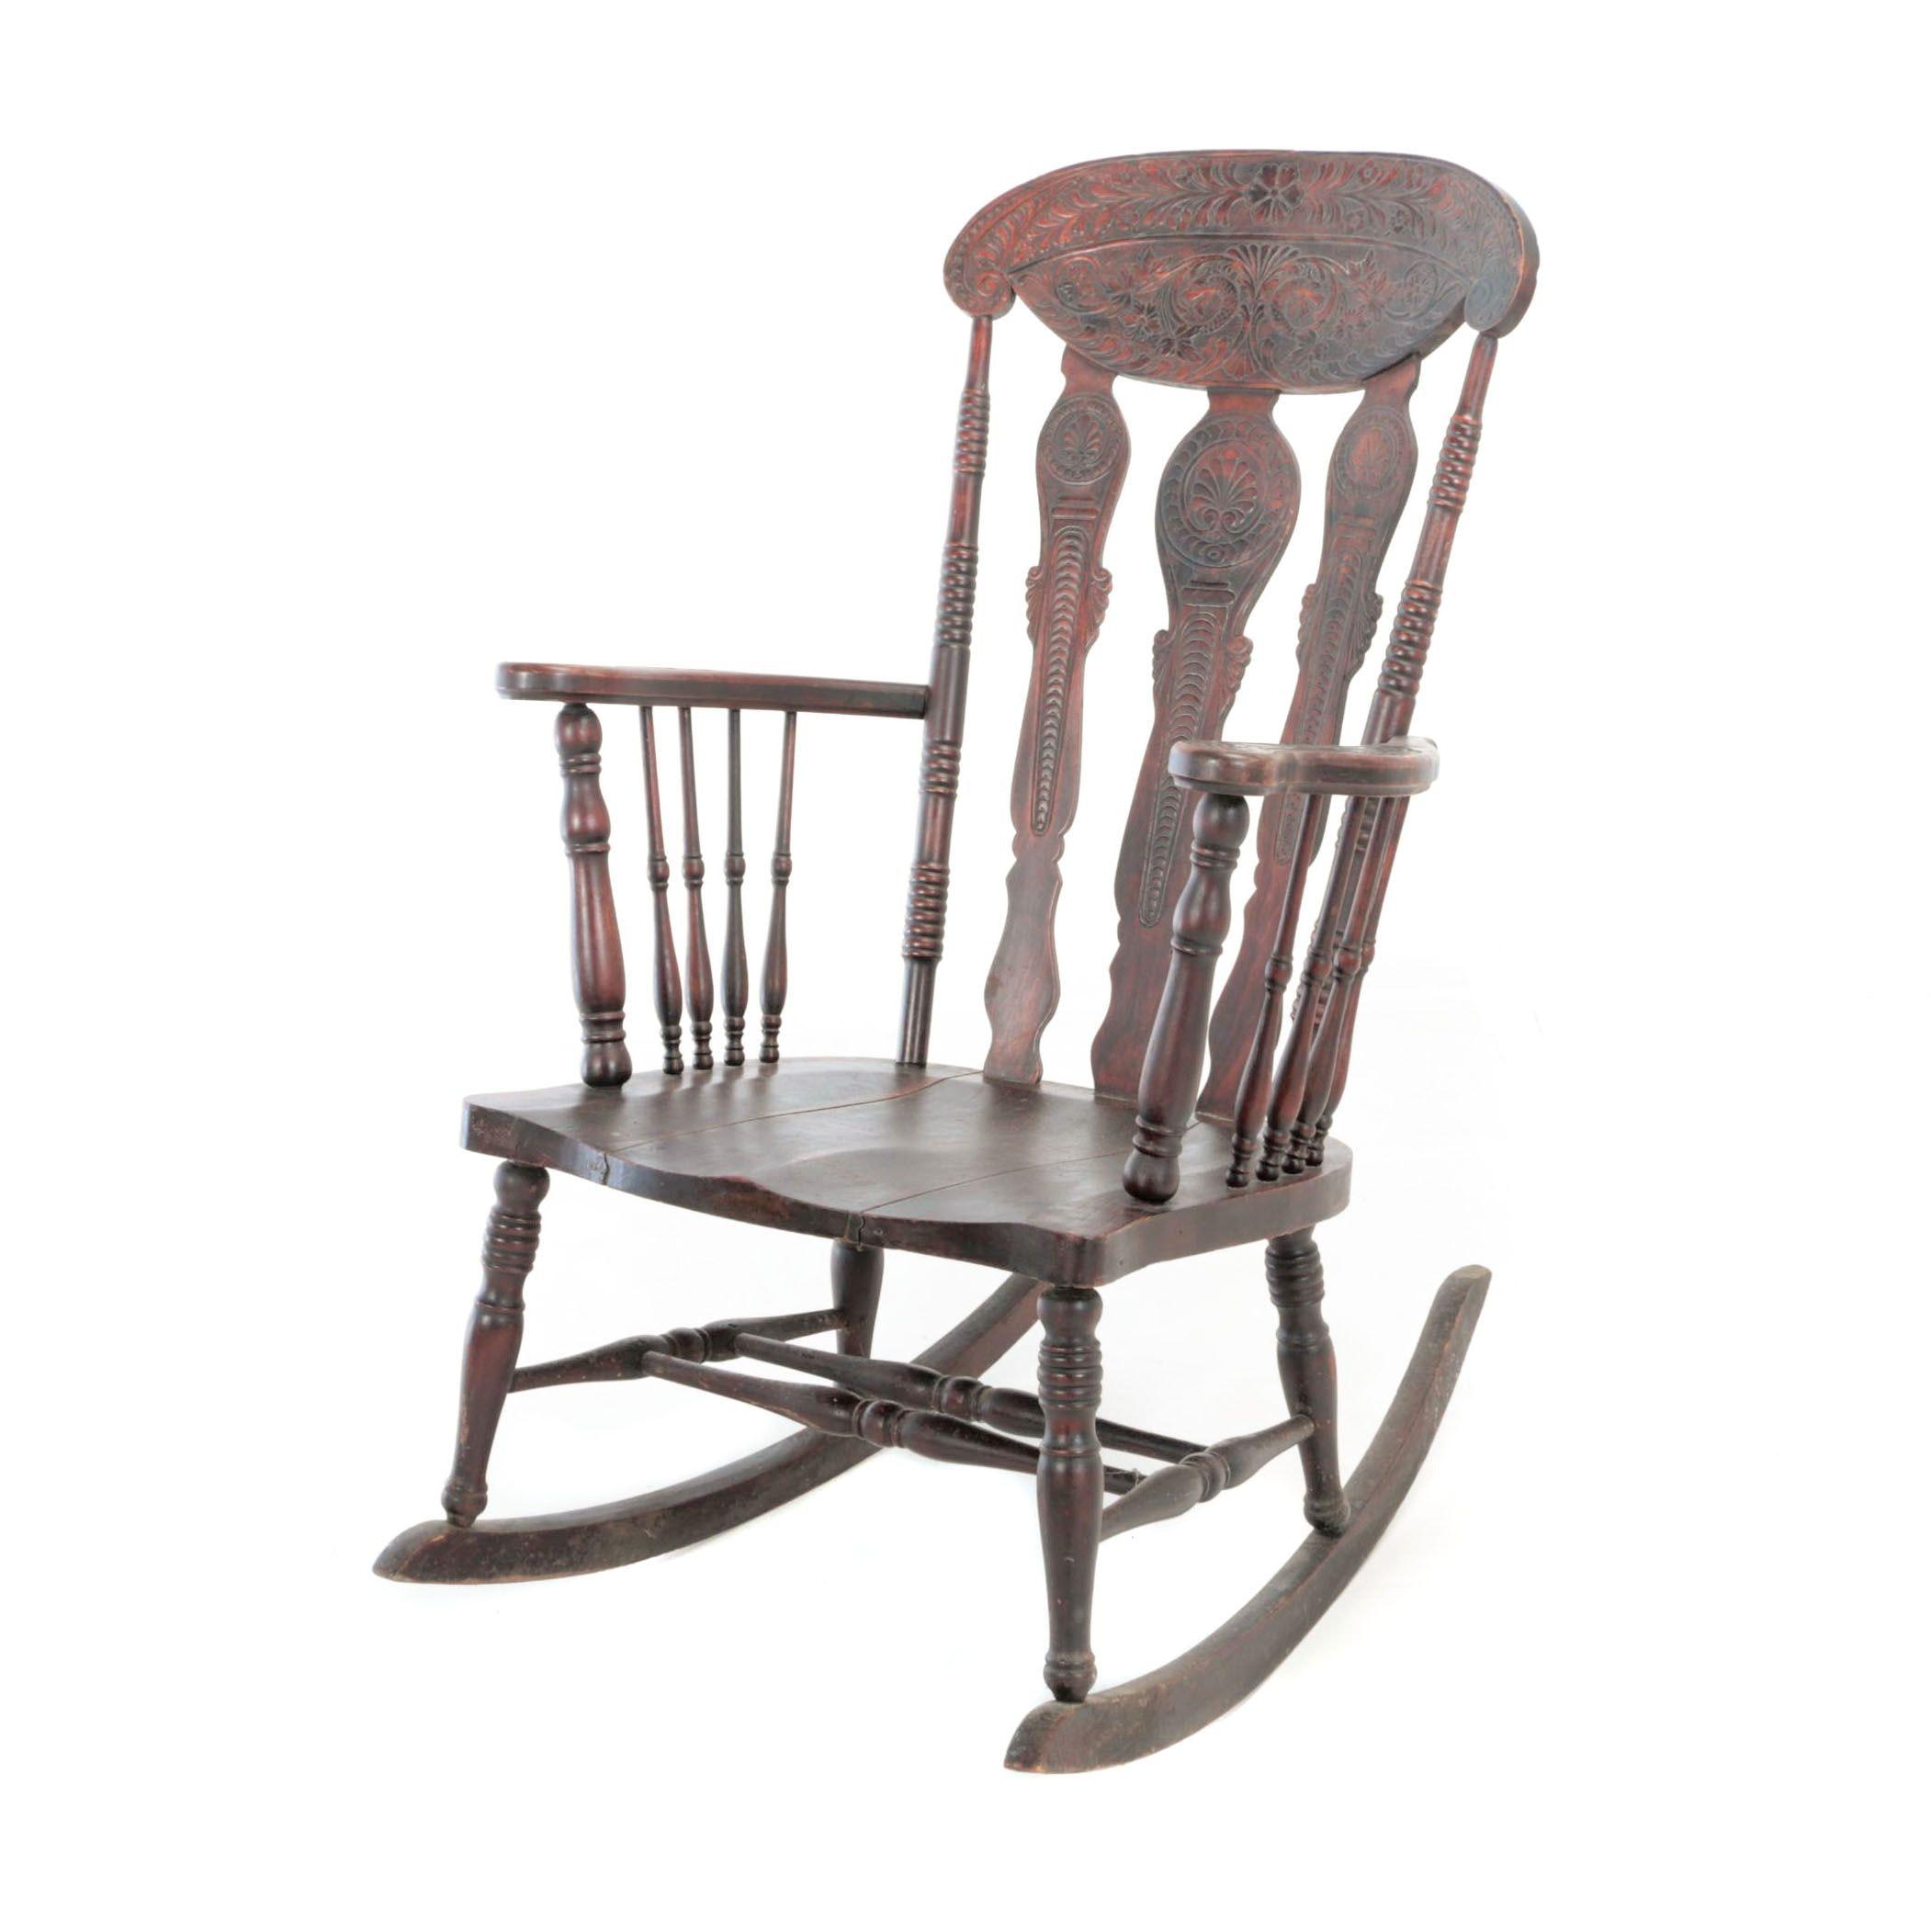 Late Victorian Press-Back Rocking Armchair, Circa 1900